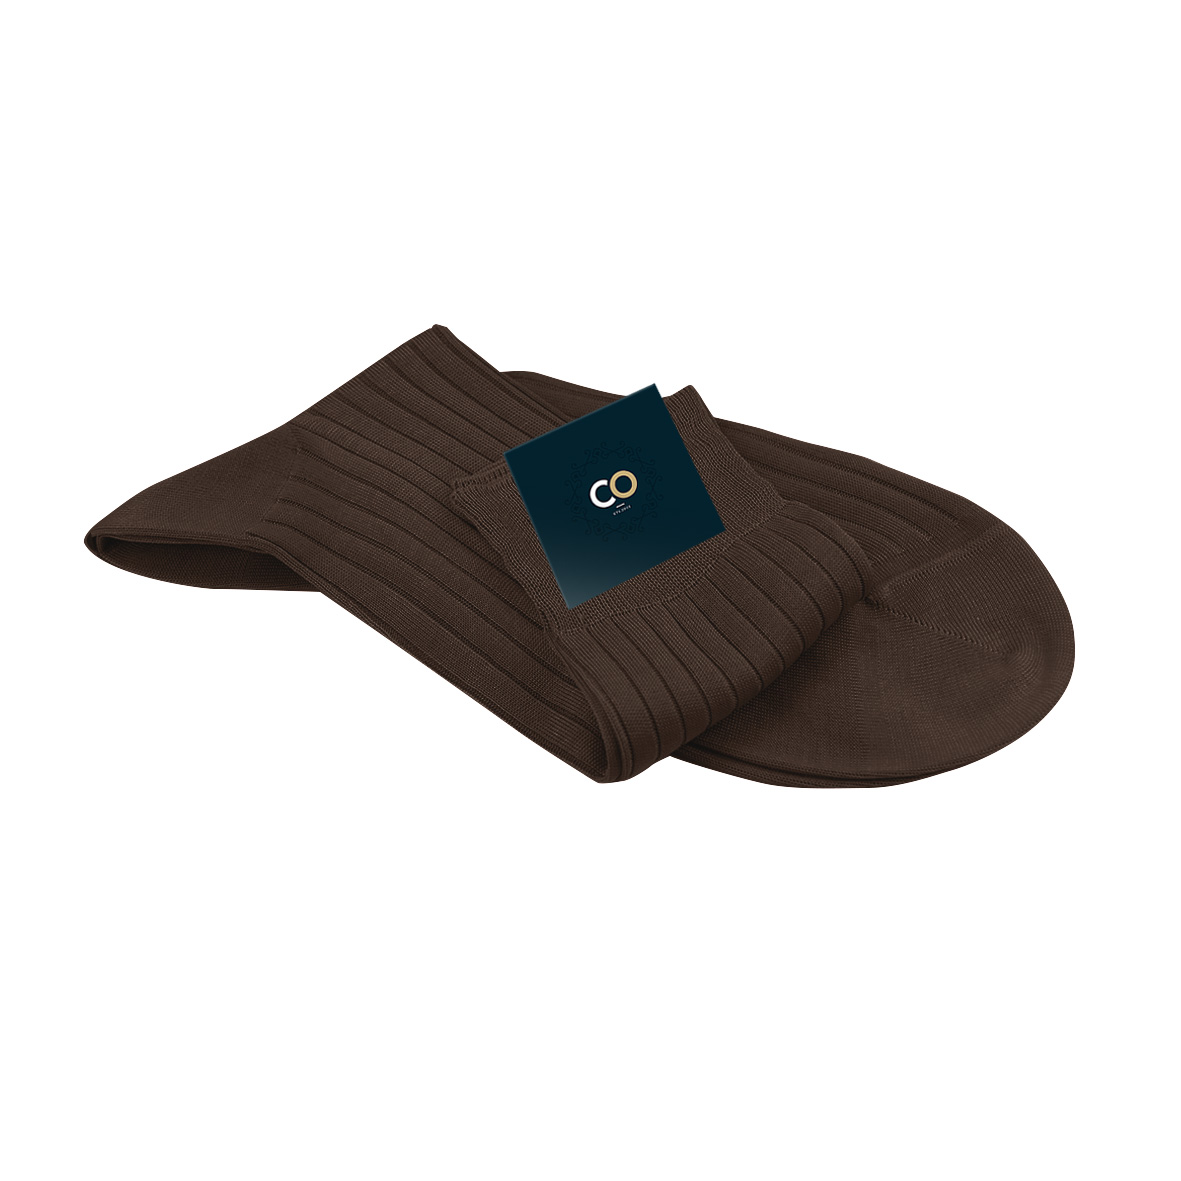 Chaussette marron chocolat, Medard